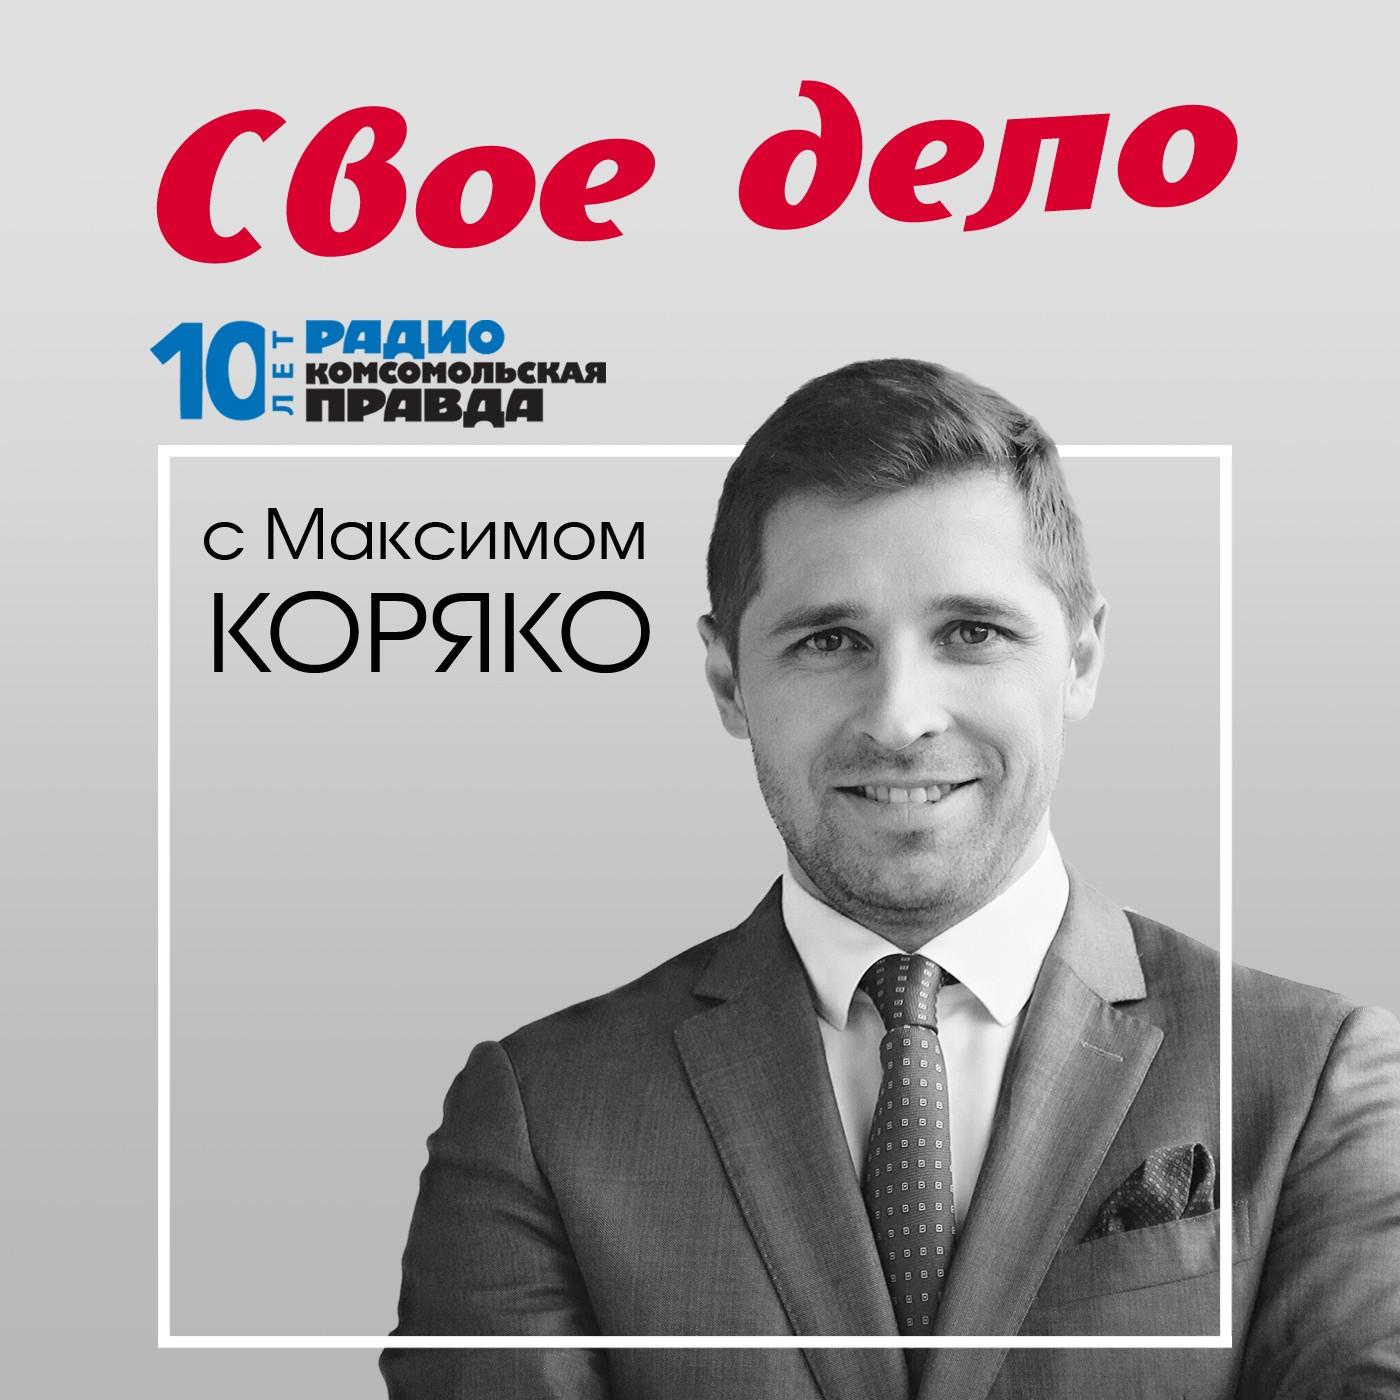 Радио «Комсомольская правда» Плюсы и минусы онлайн кассы